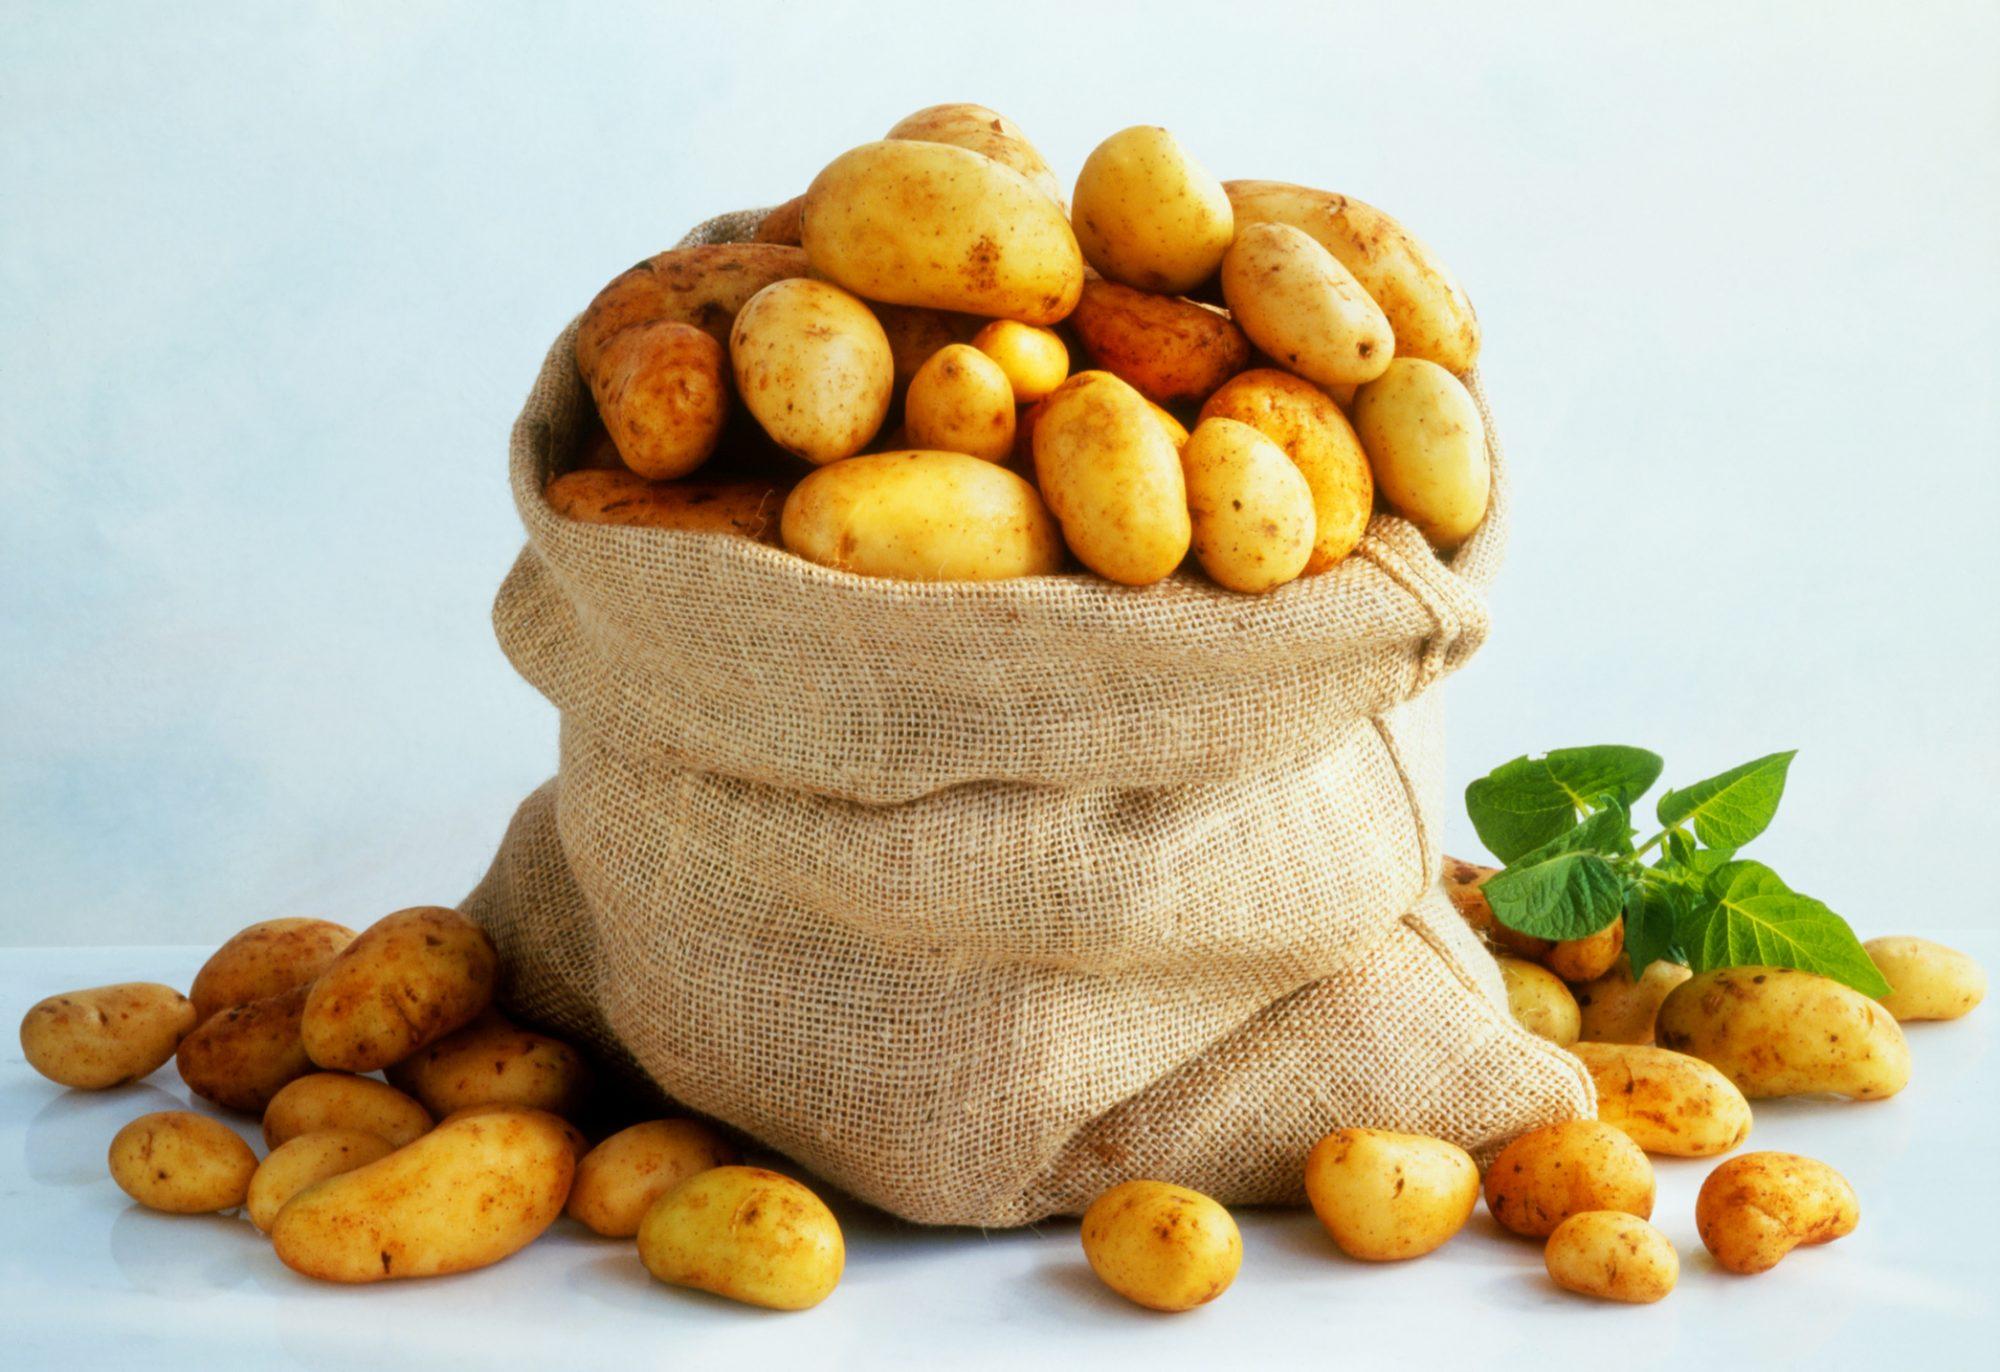 potato-sack-getty-image